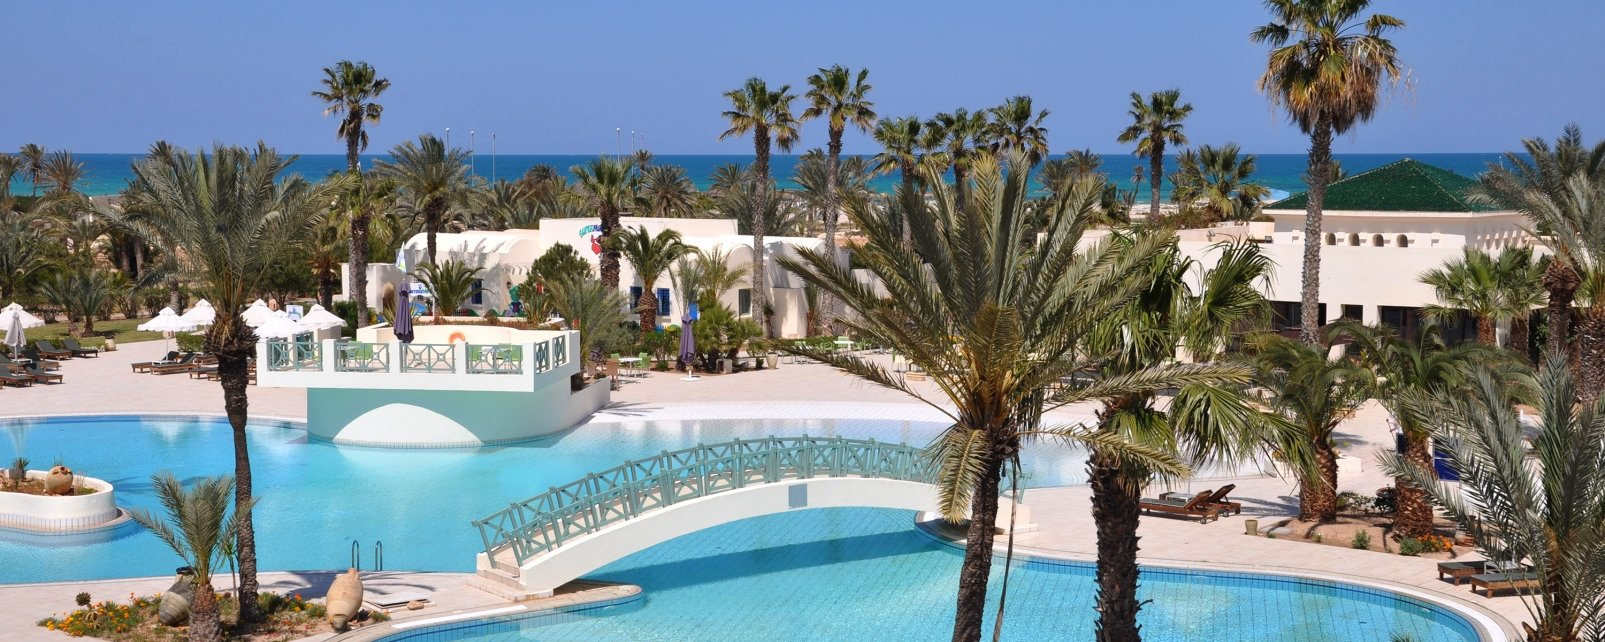 Hotel yadis golf thalasso spa djerba tunesien for Hotels djerba